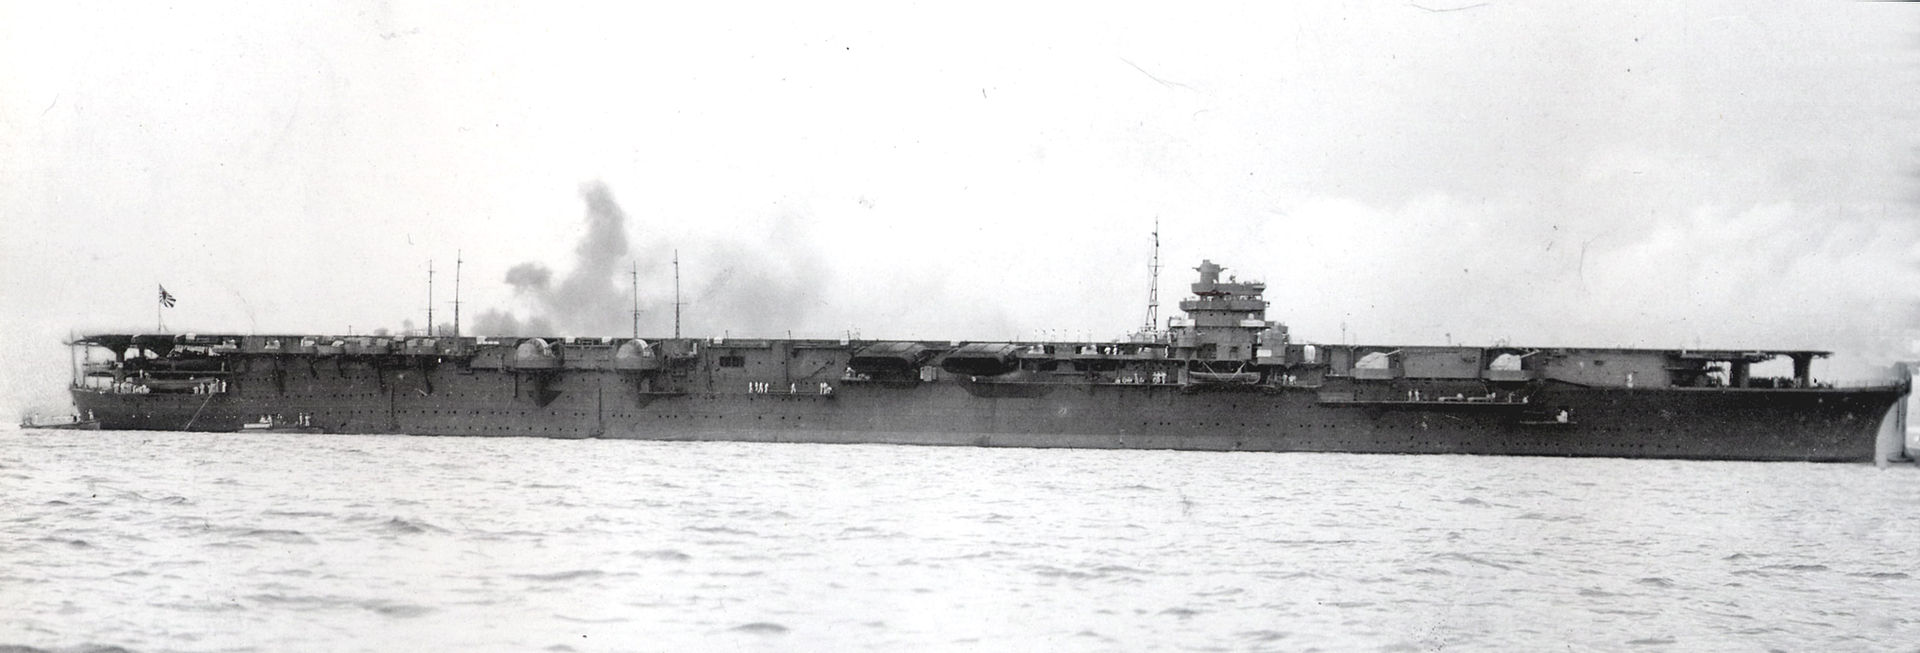 Warship Class - Shōkaku - Carrier